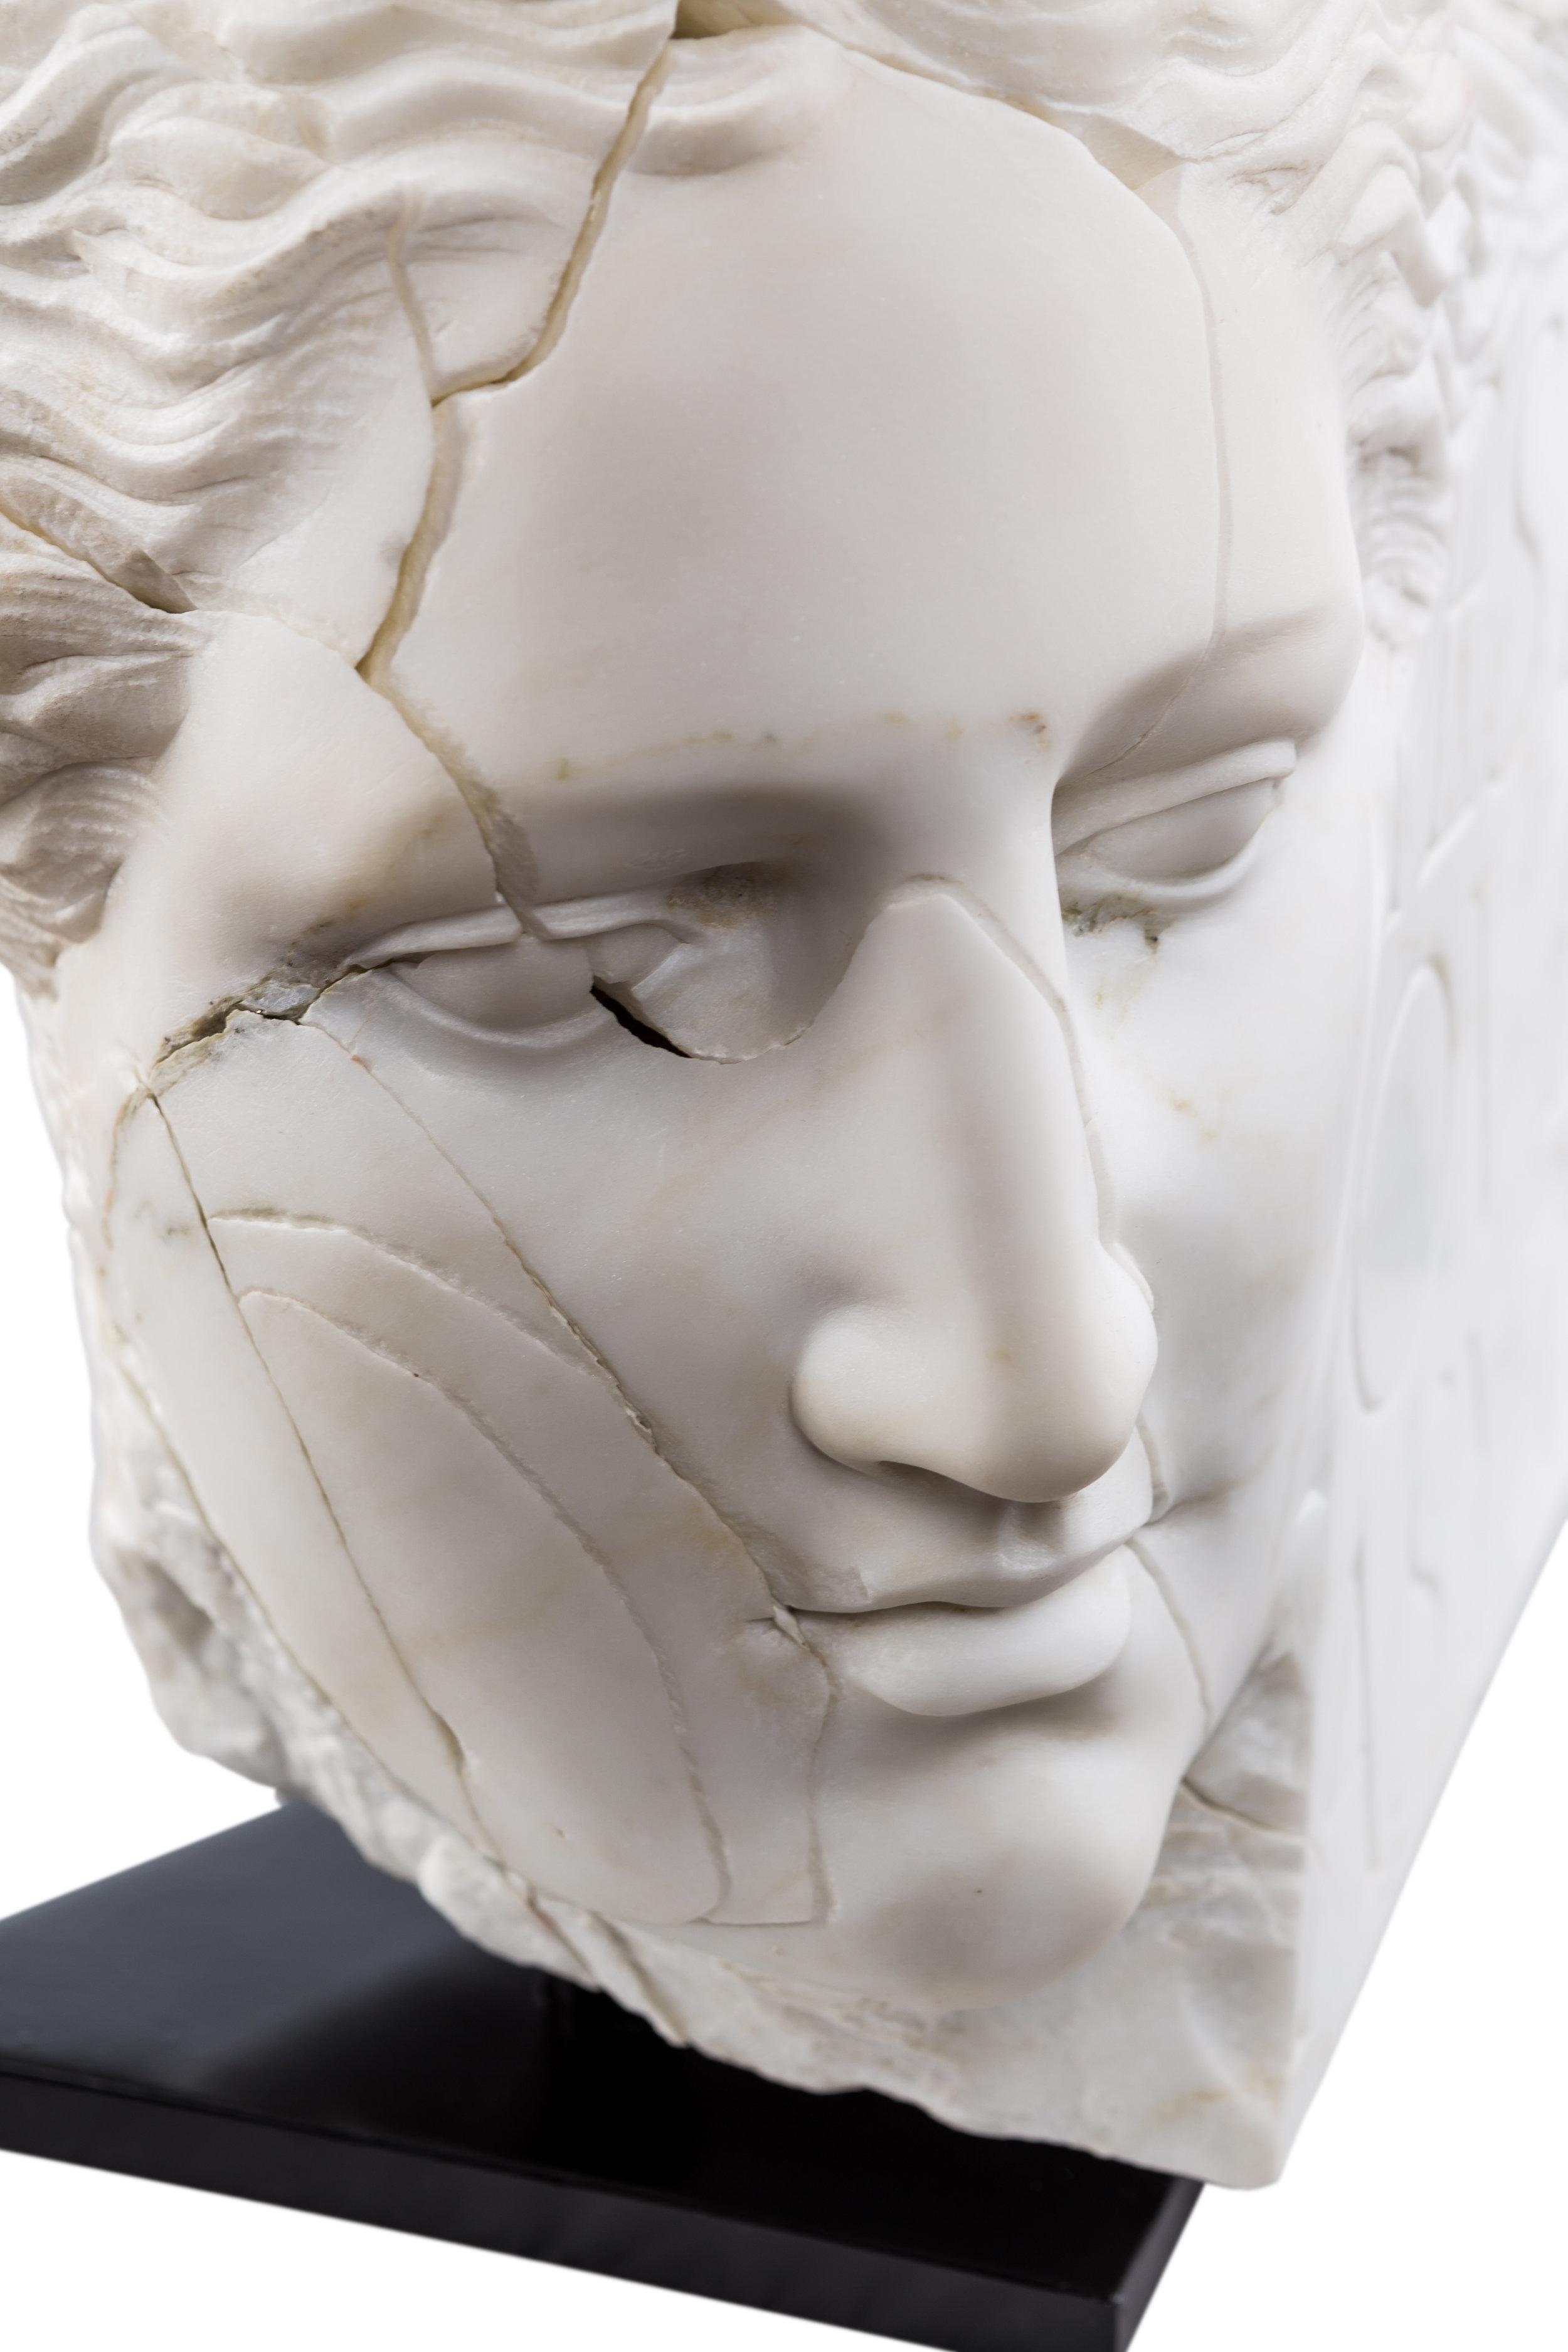 Yesterday, 2018, Carrara marble, 18 1/10 in x 14 1/5in x 9 1/10 in (46 x 36 x 23 cm)